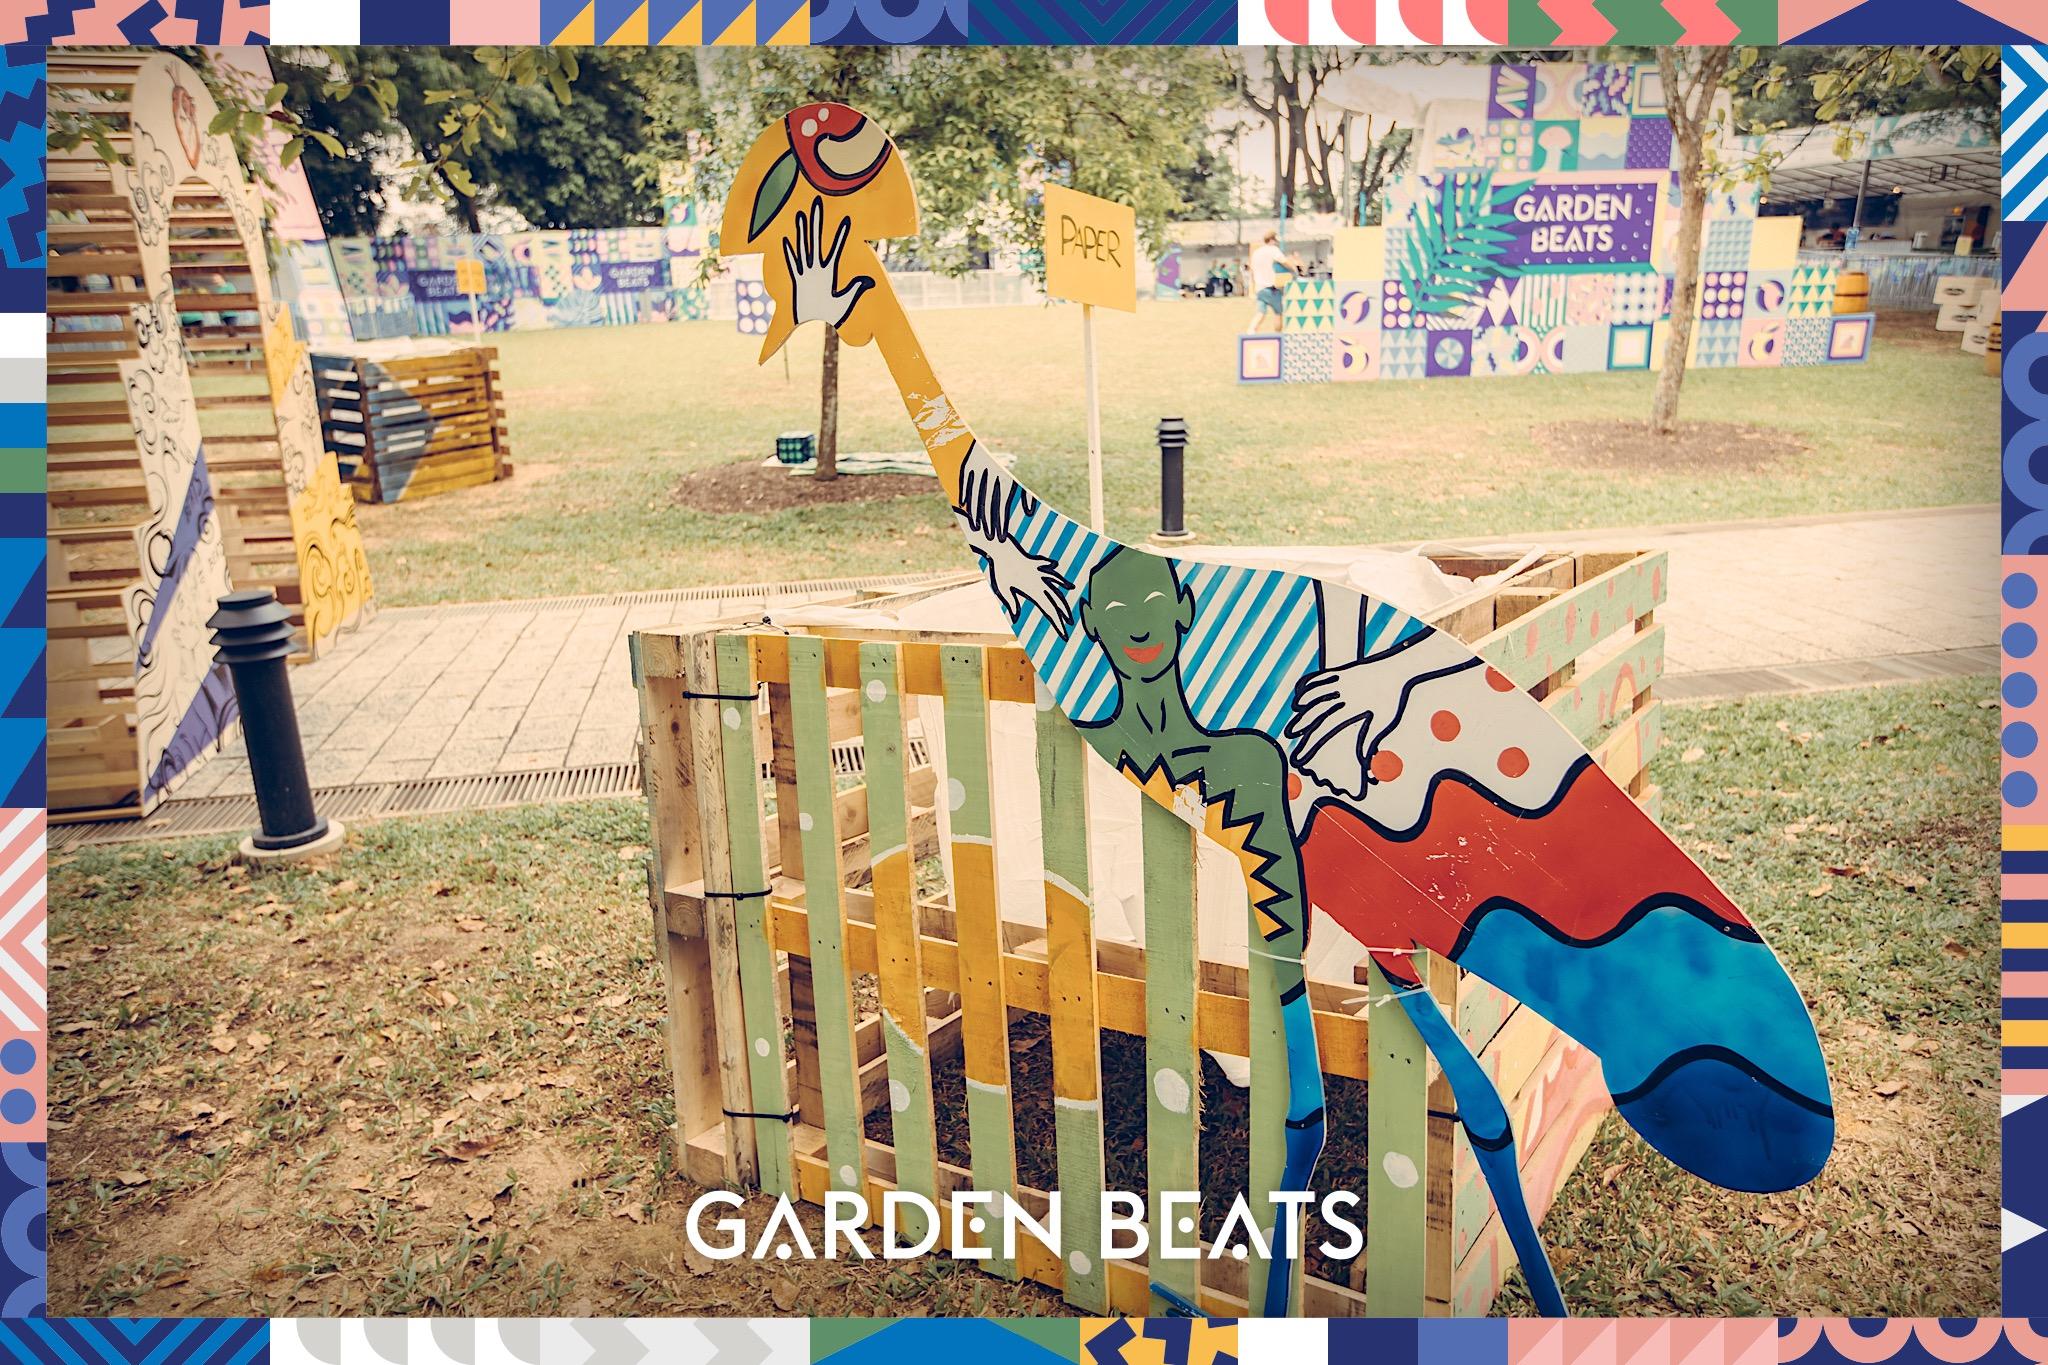 03032018_GardenBeats_Colossal115_Watermarked.jpg